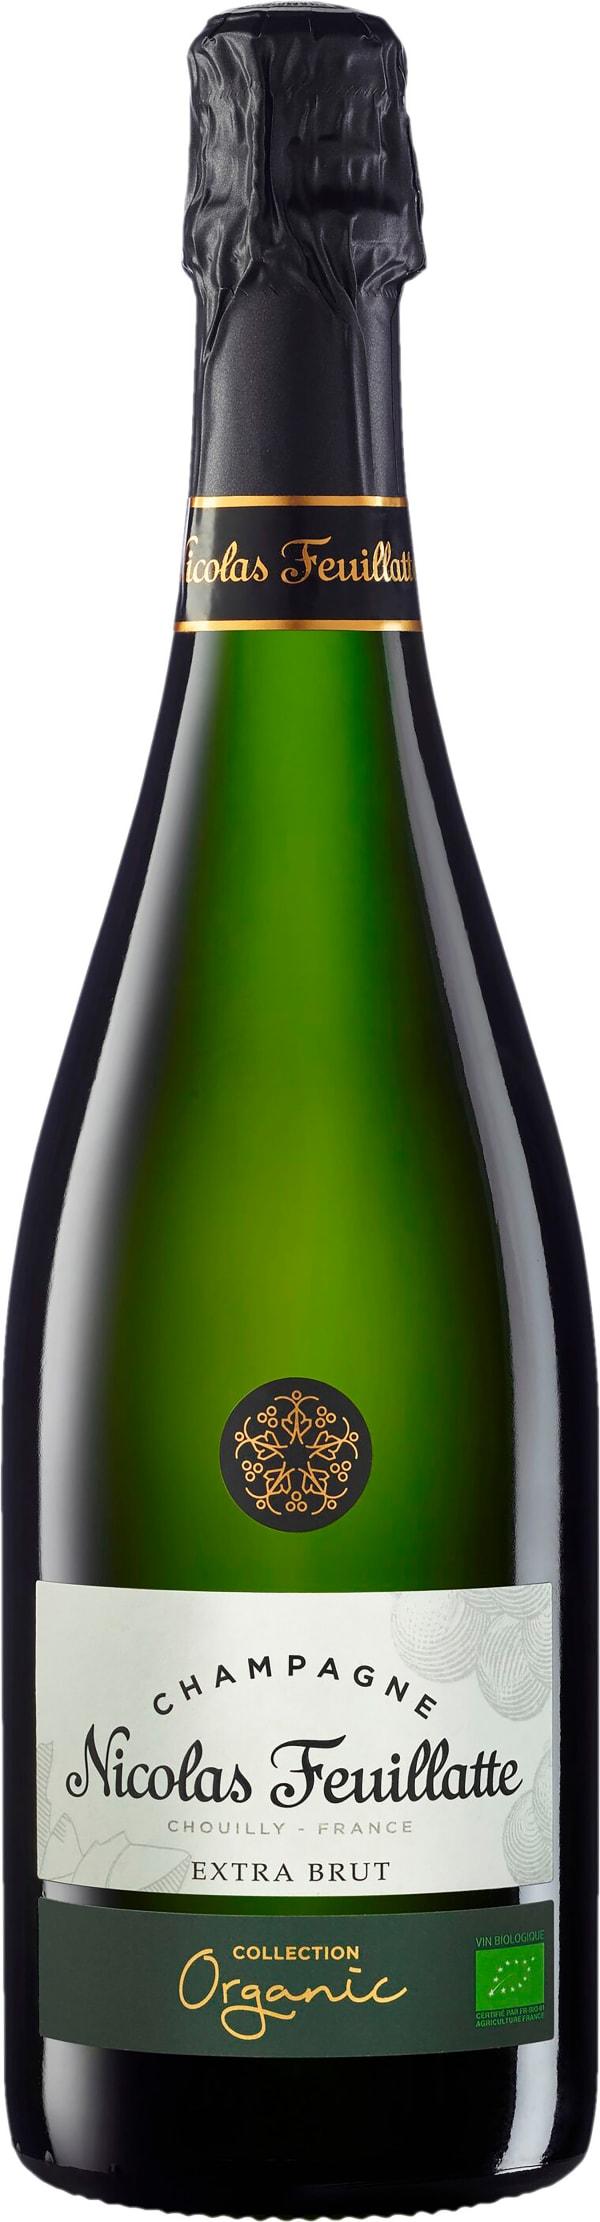 Nicolas Feuillatte Fondamental Champagne Brut